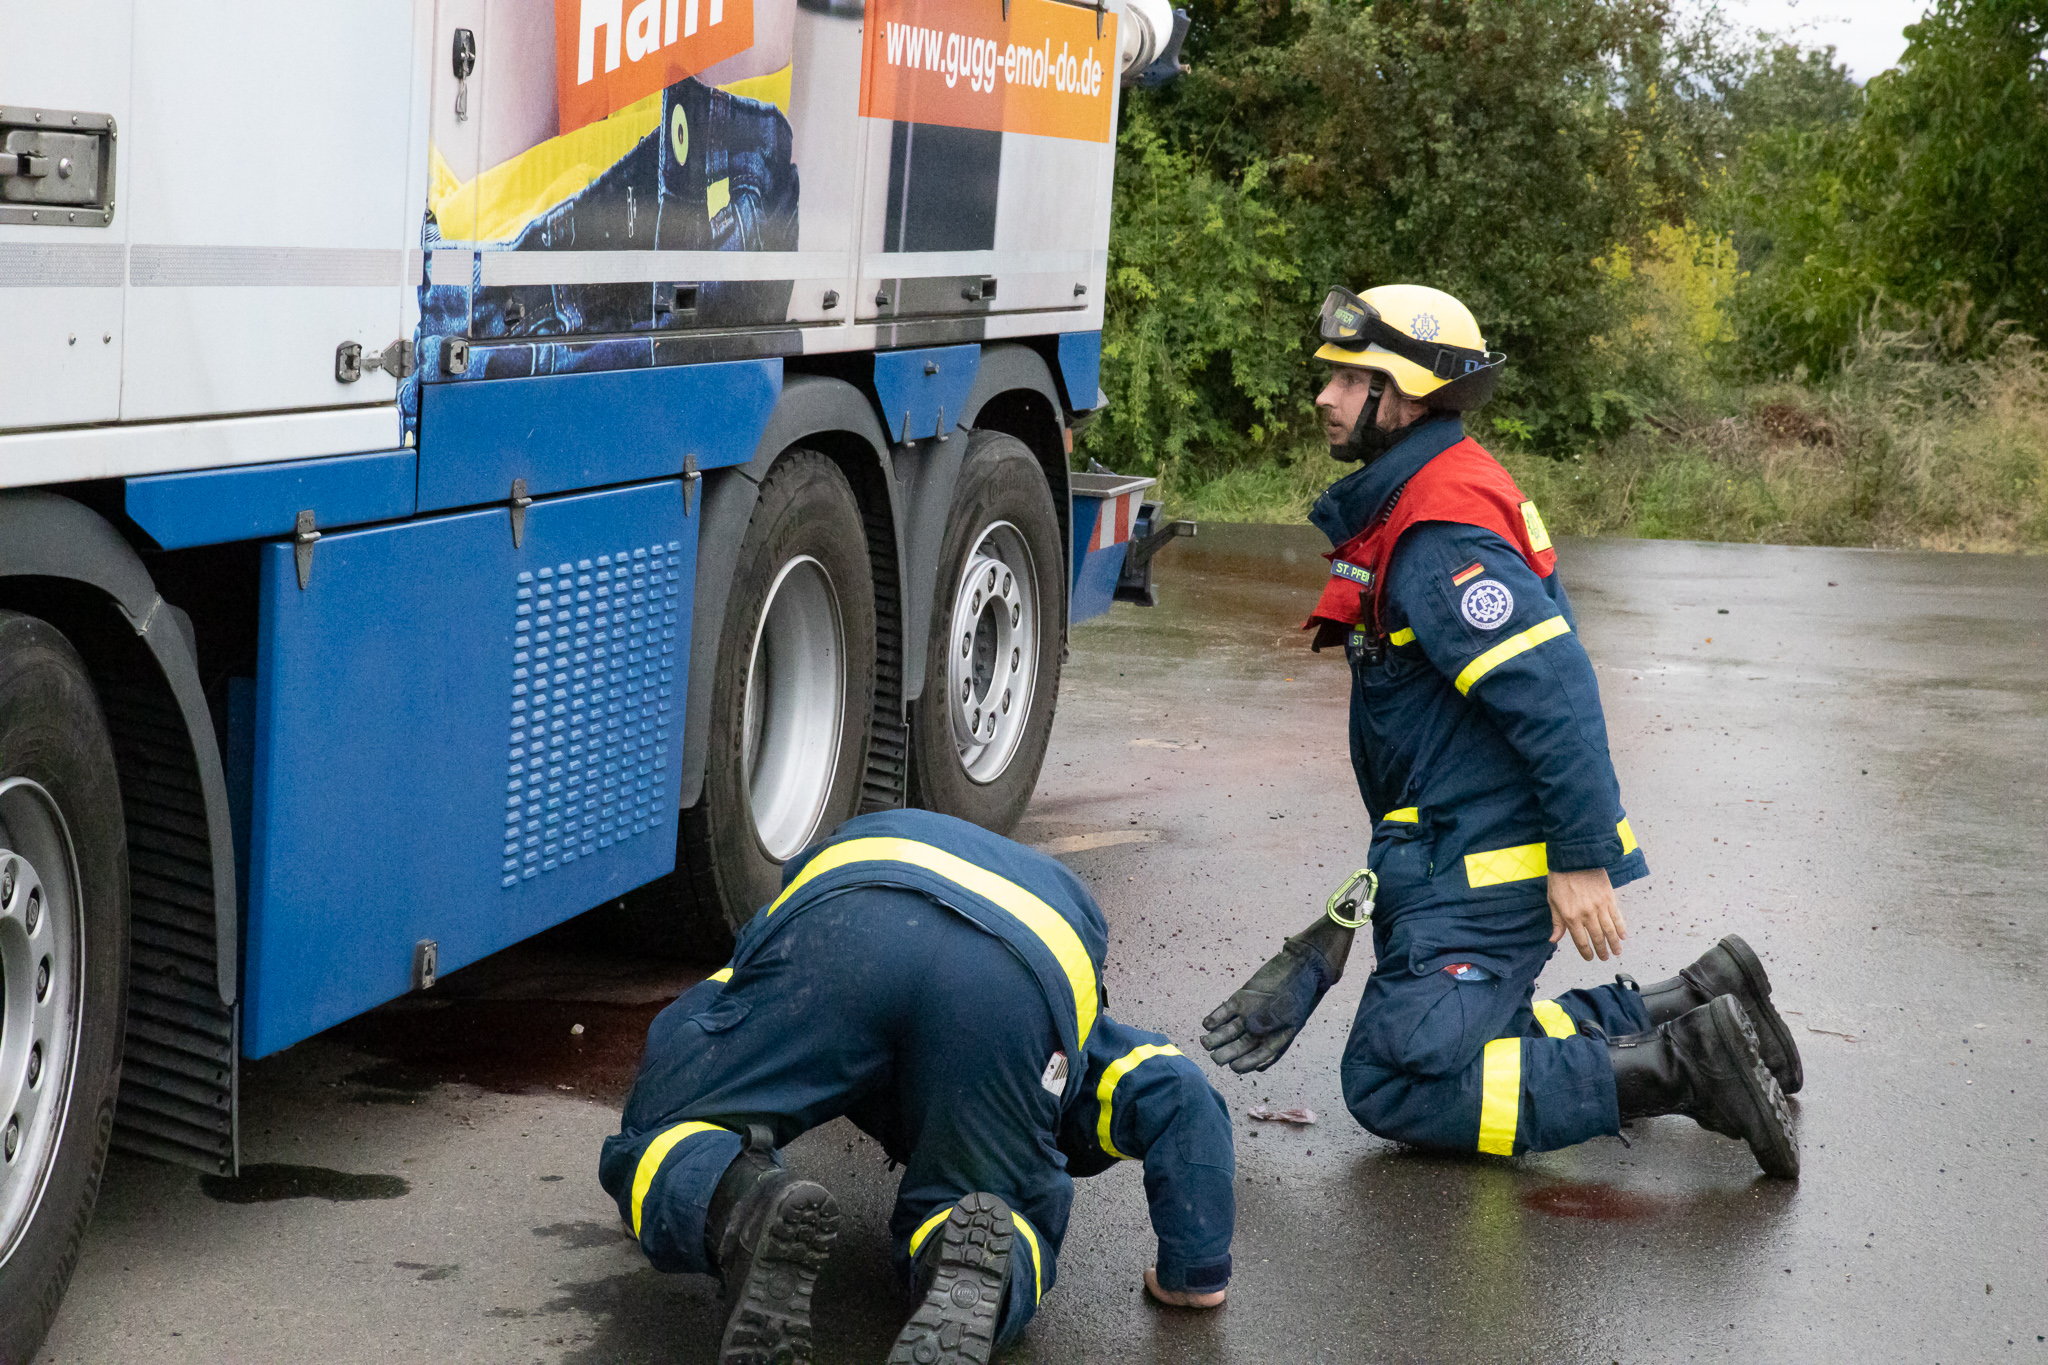 FeuerwehrSim 2019 Henckackerweg-6